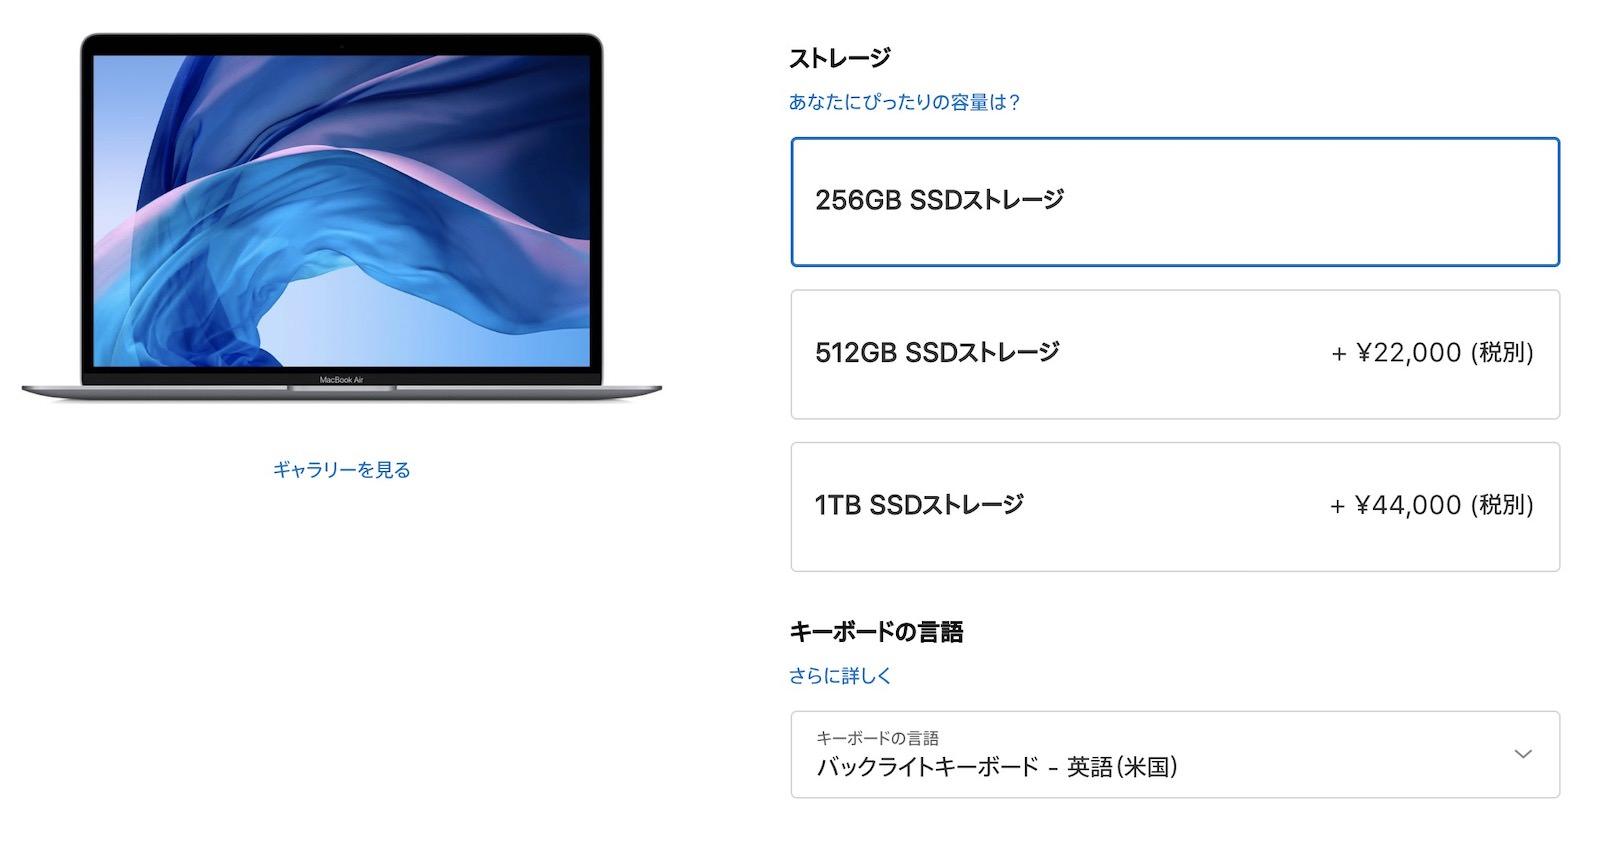 Macbook air ssd option